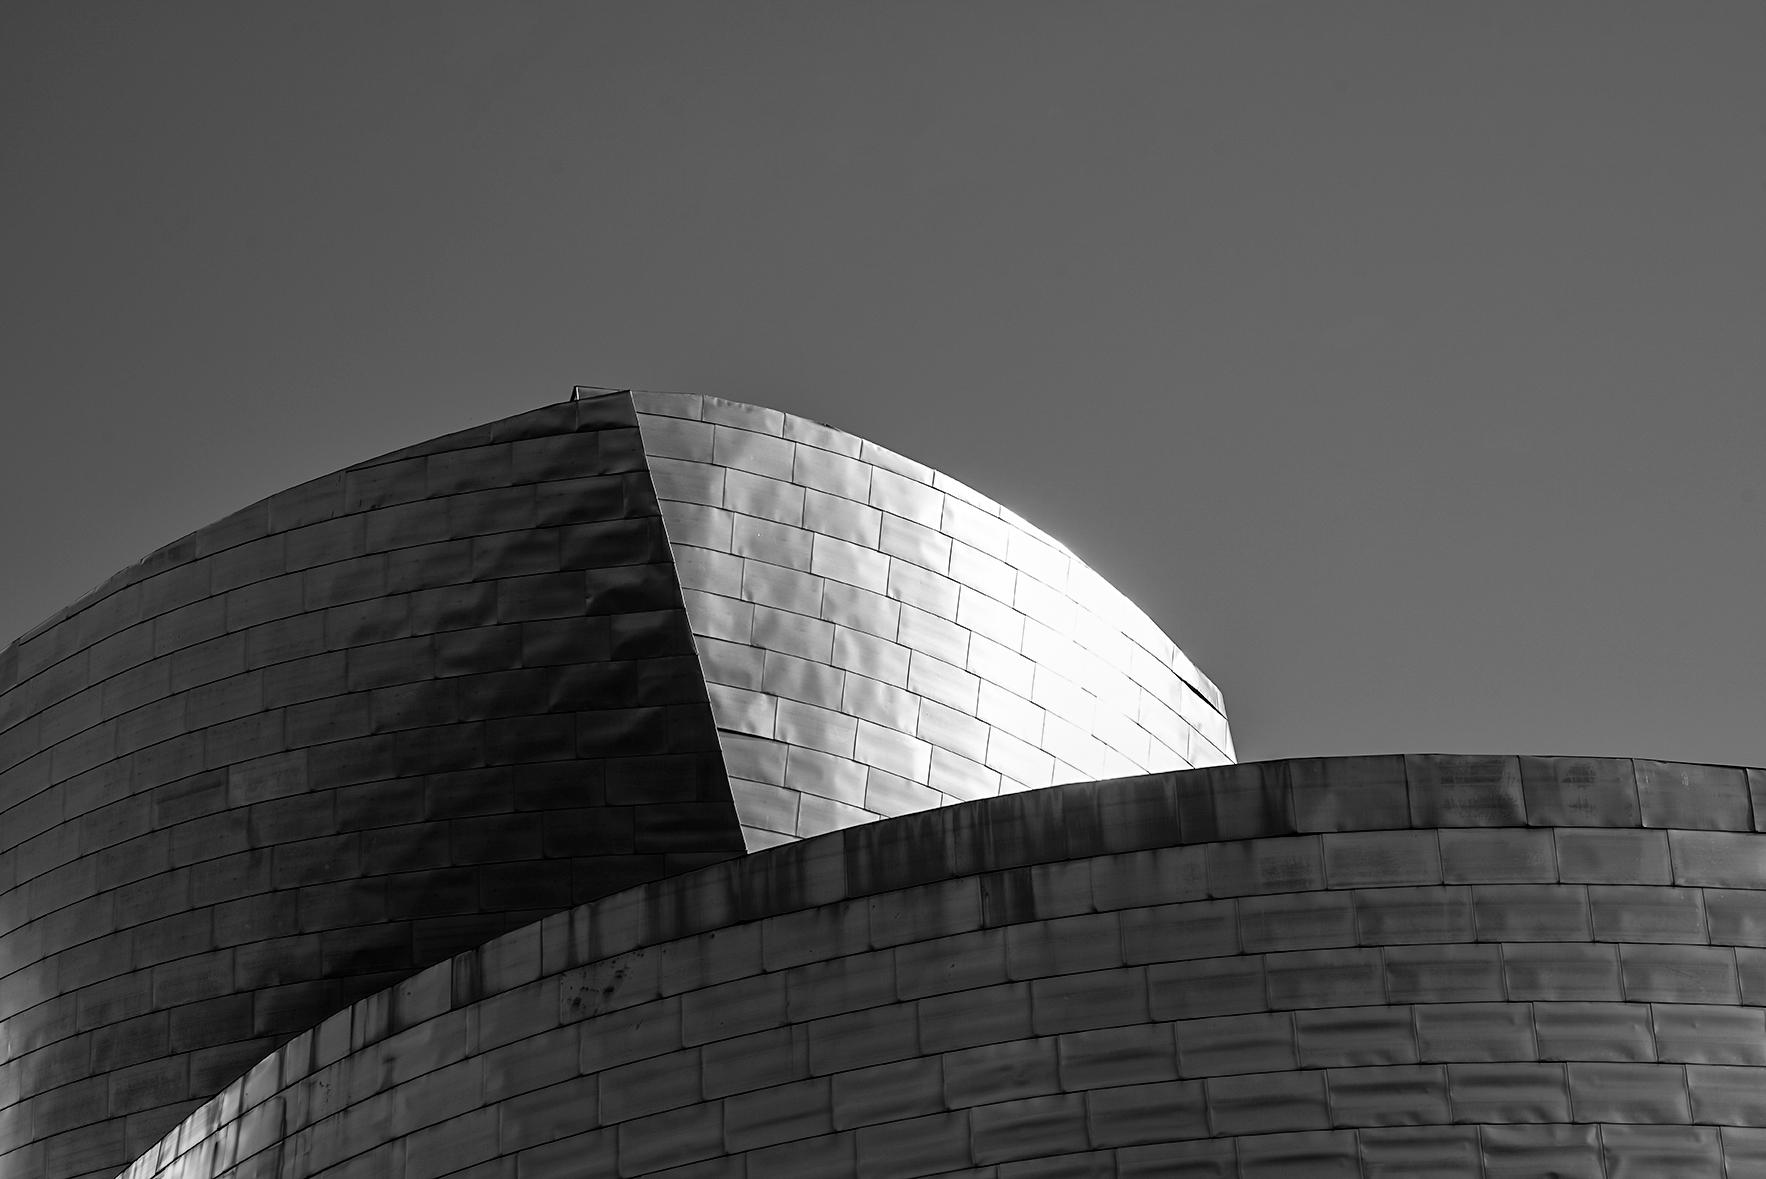 Ioannis-Stamou-arquitectura-30